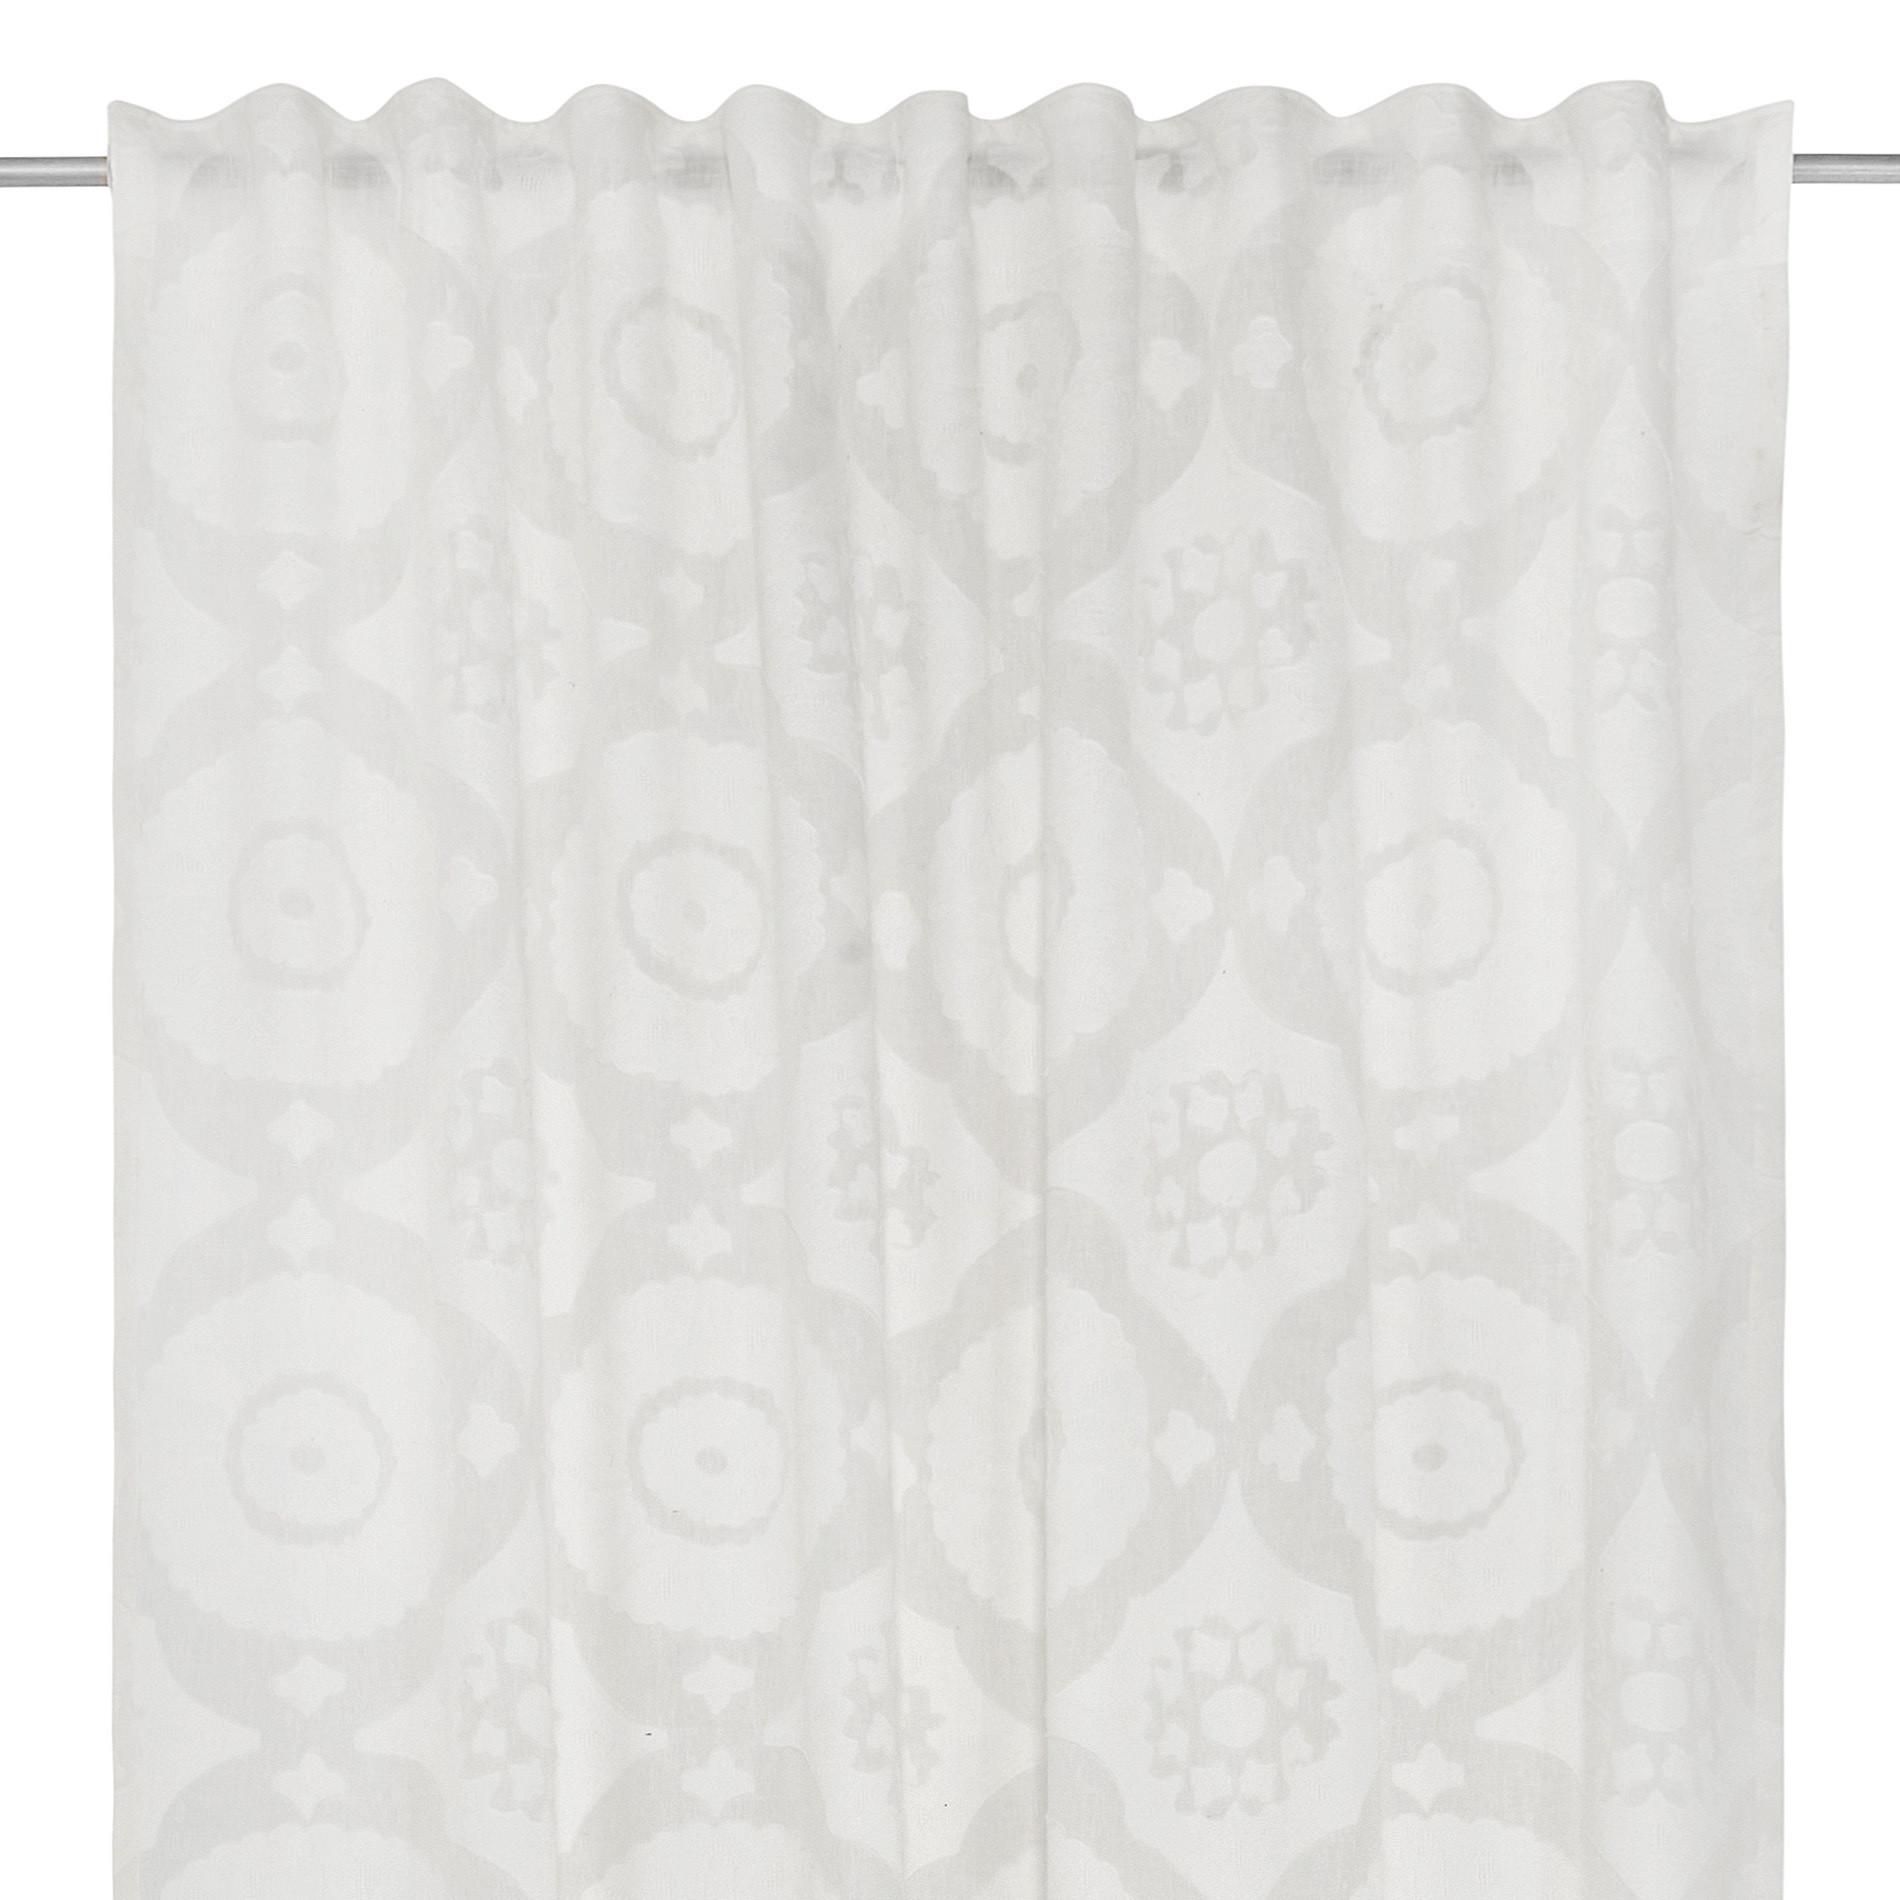 Tenda devore motivo geometrico passanti nascosti, Bianco, large image number 3